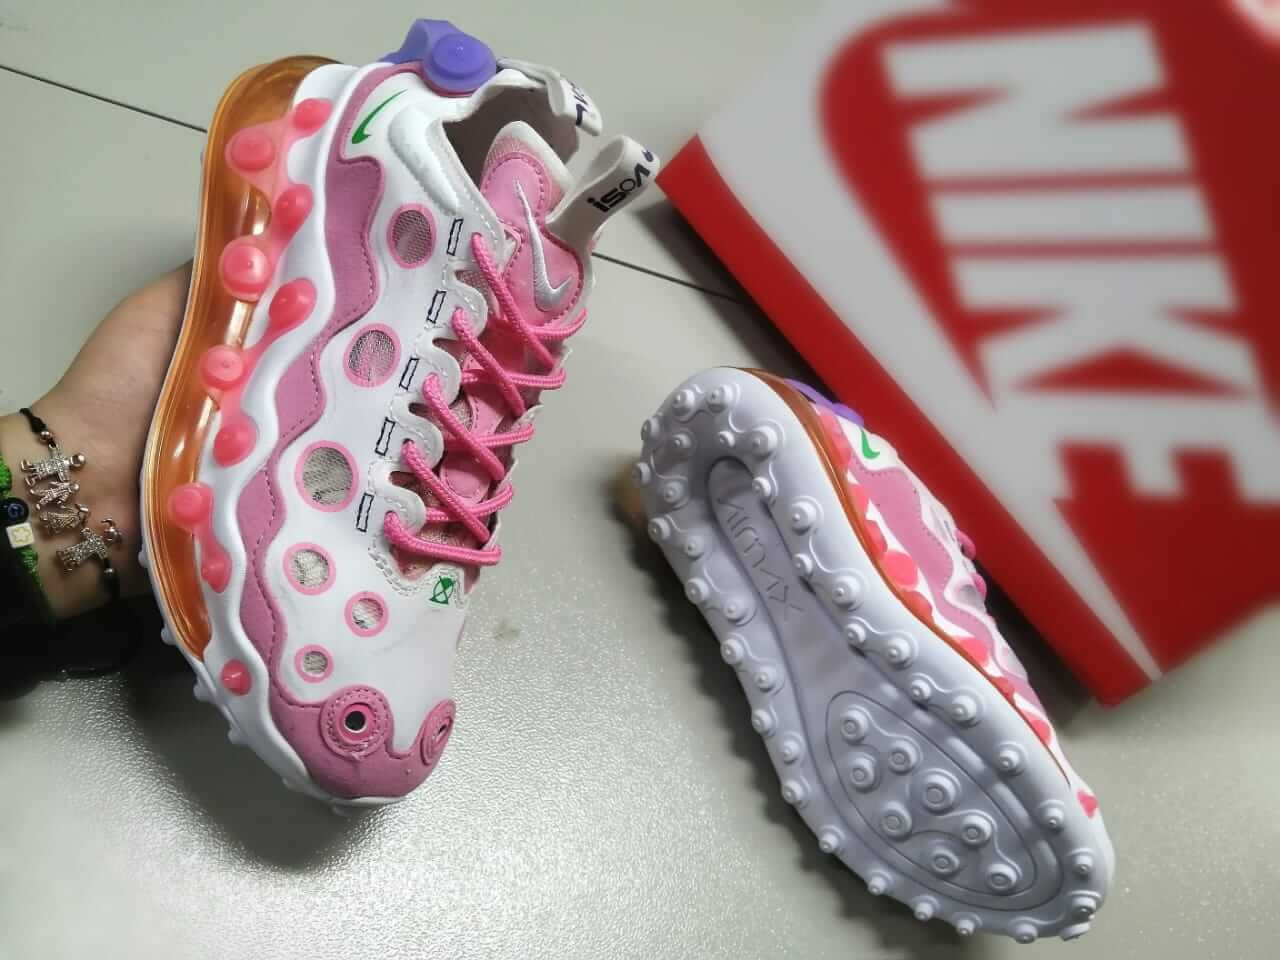 Zapatillas para Mujer Nike iSPA Air Max 720 running, suaves, cómodas, Rosado